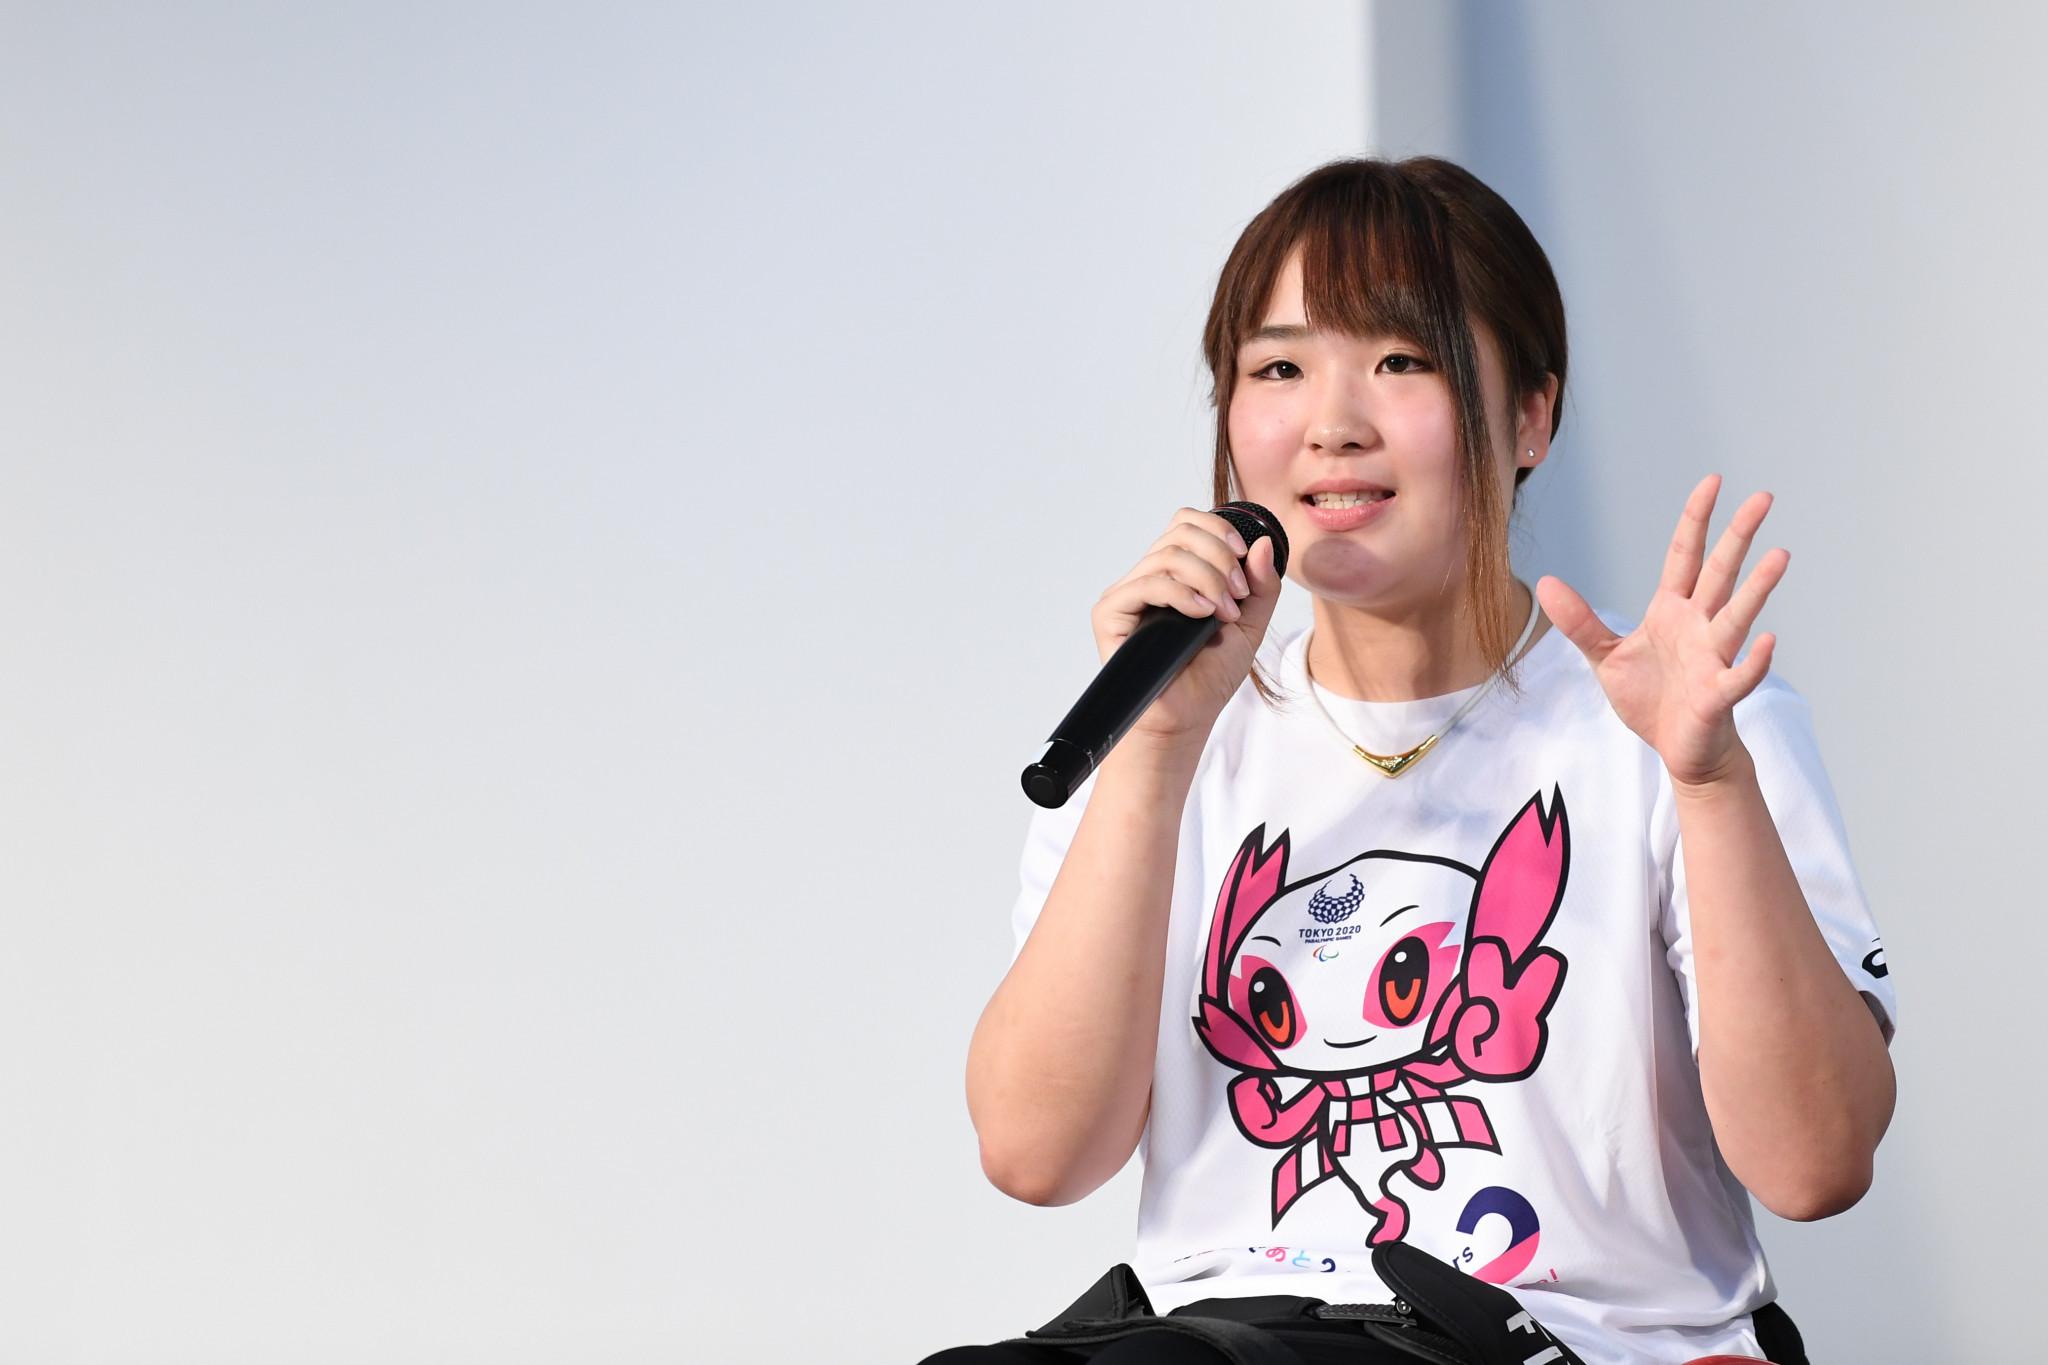 Sarina Satomi is set to star at Tokyo 2020, where para-badminton will make its Paralympic debut ©Getty Images